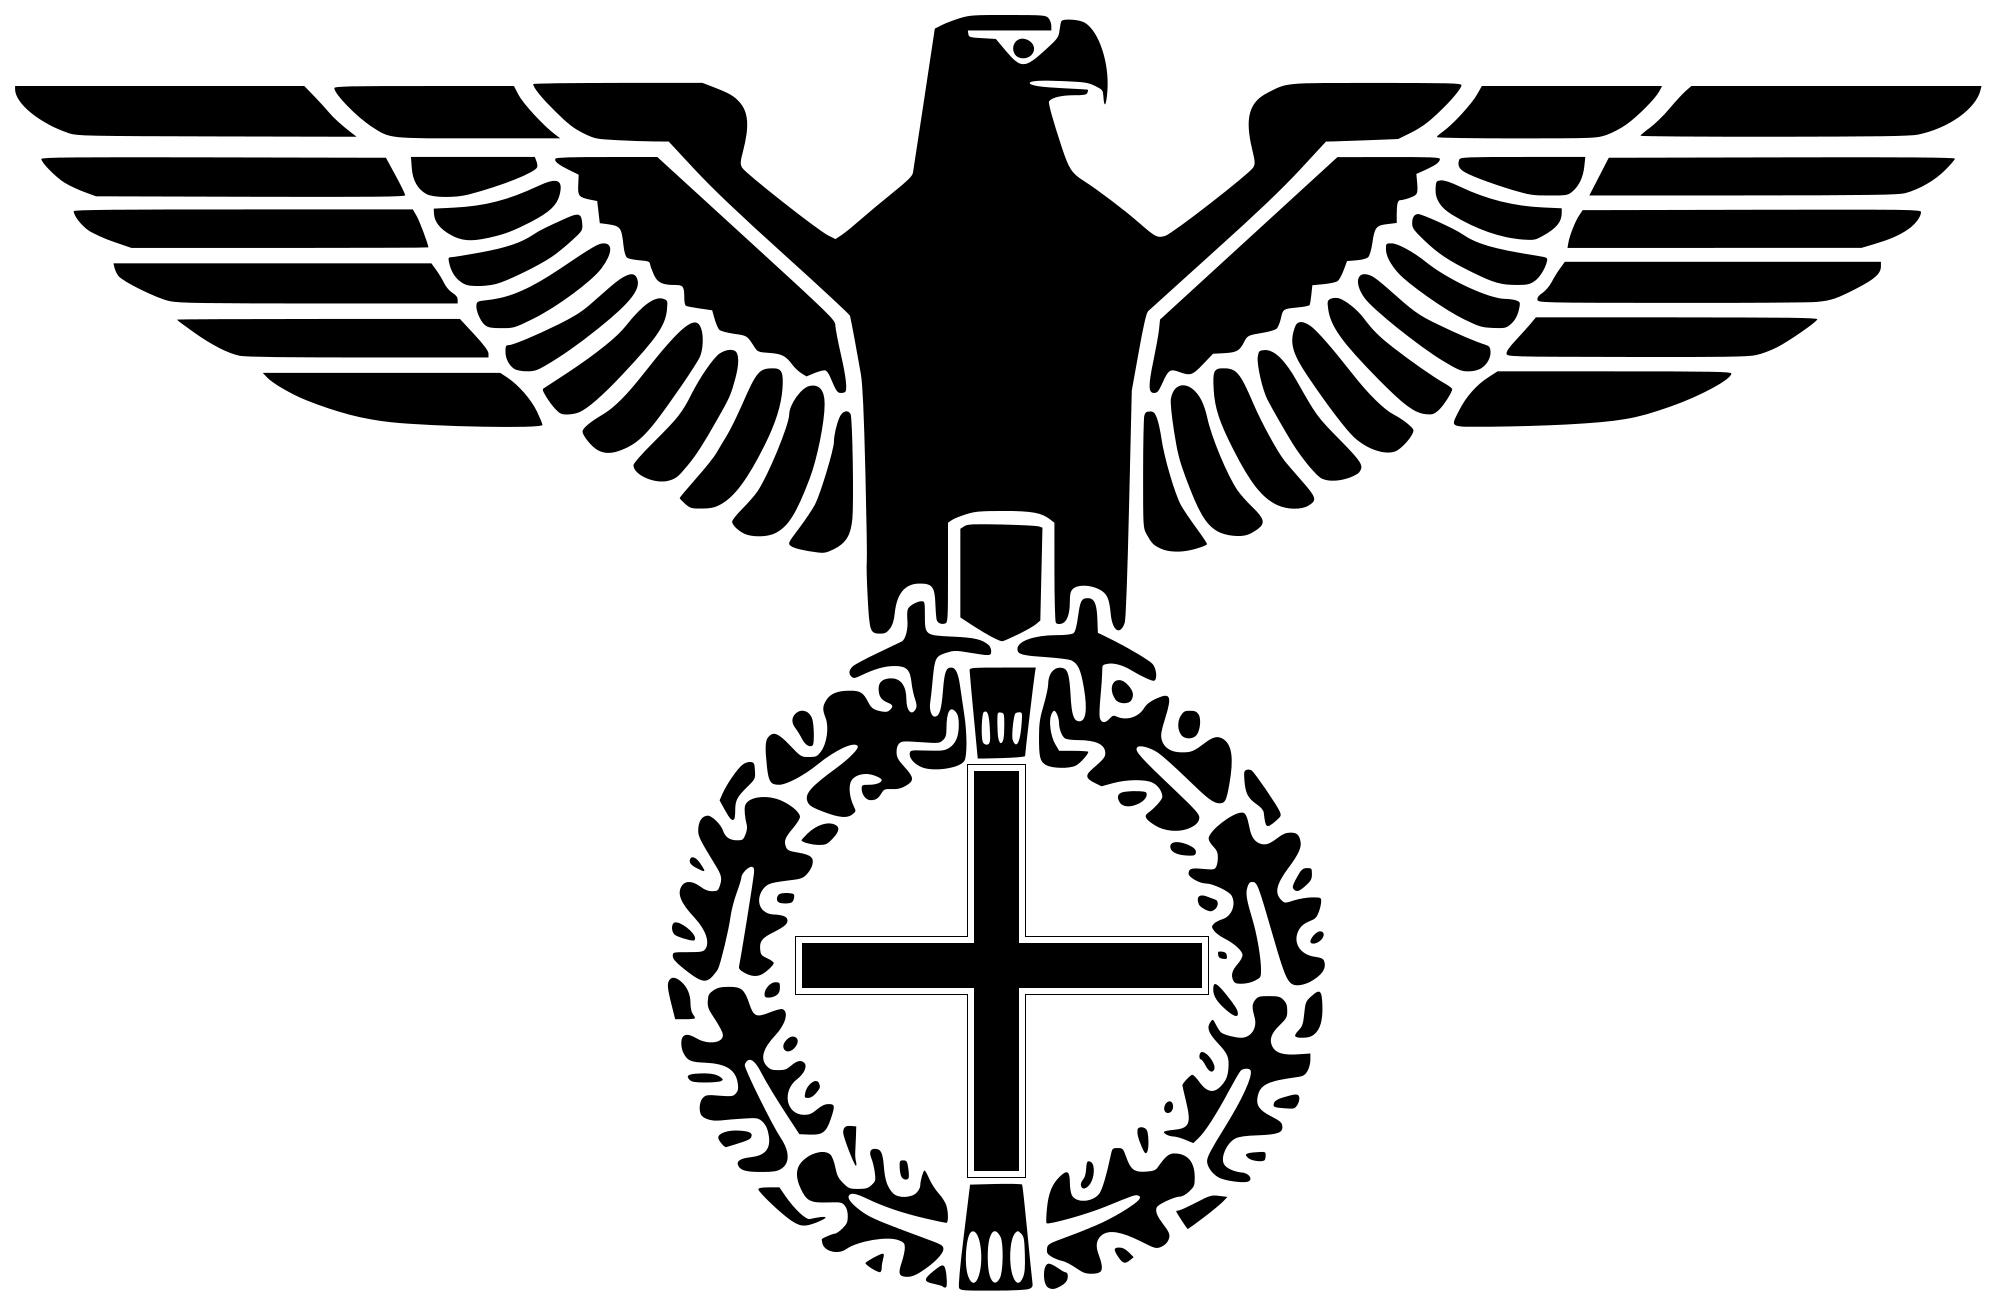 Top Logo Design political logo maker : German National Party (Central Victory) : Alternative ...